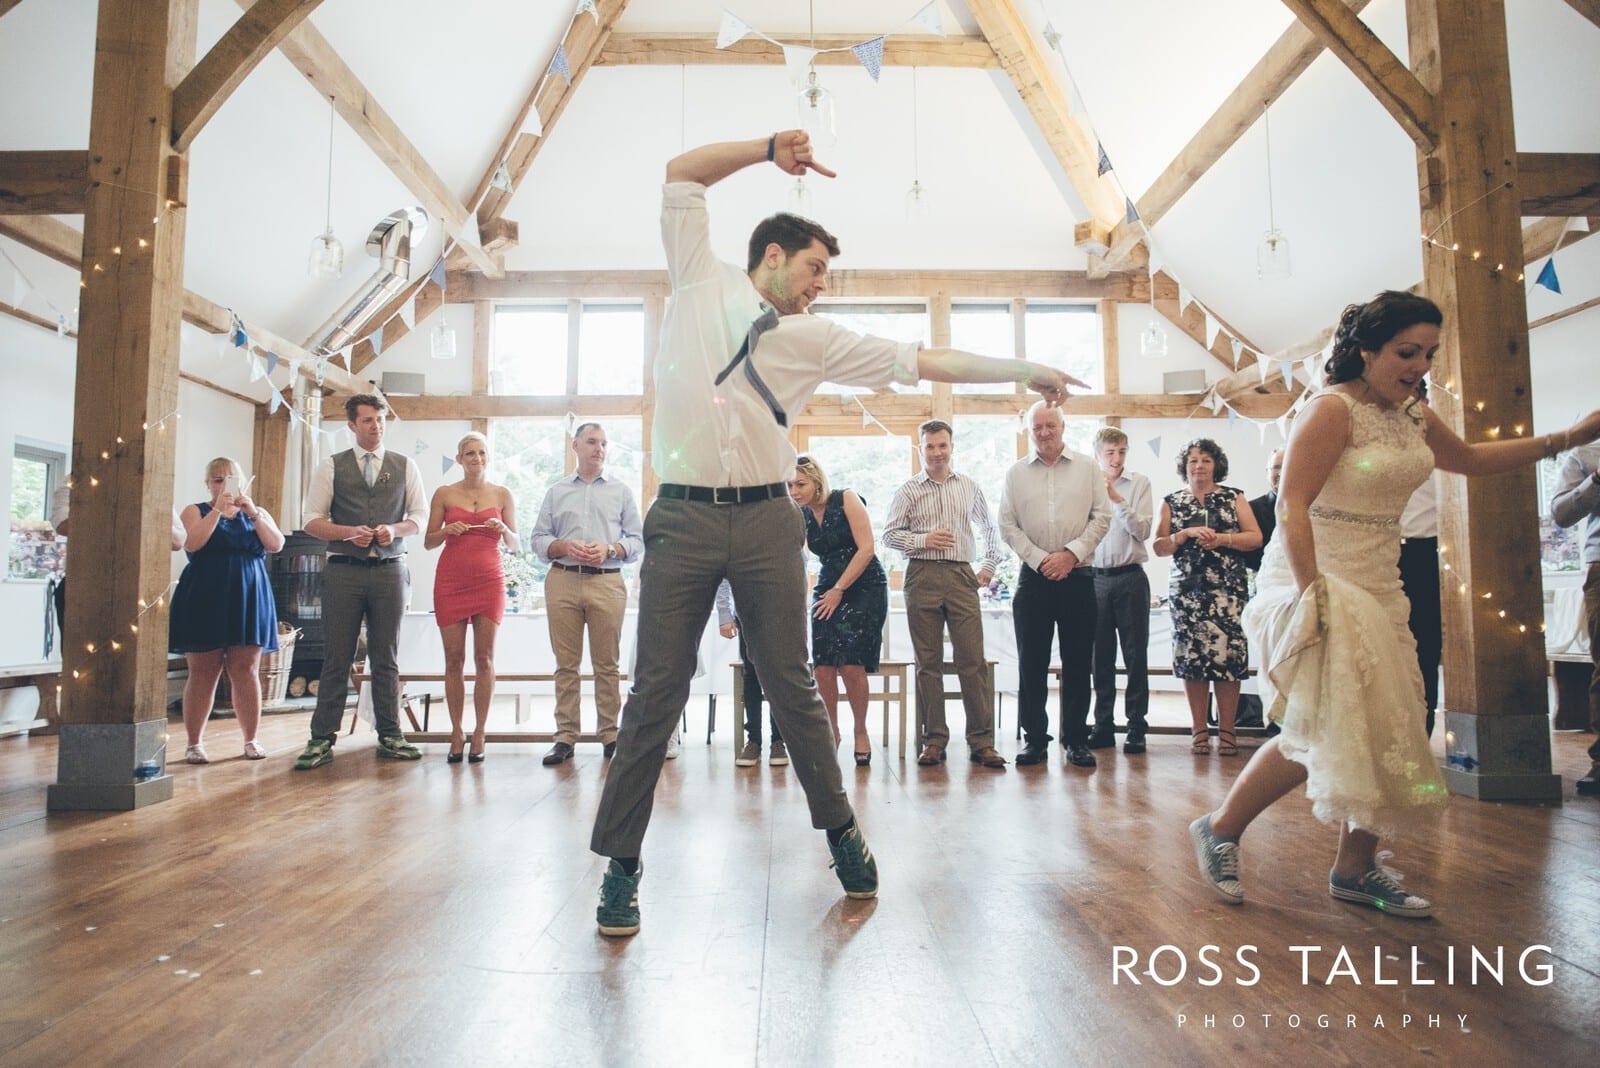 Coolest First Dance Ever Breakdancing Bride and Groom Jasmin and Ben Barnicoat_0007